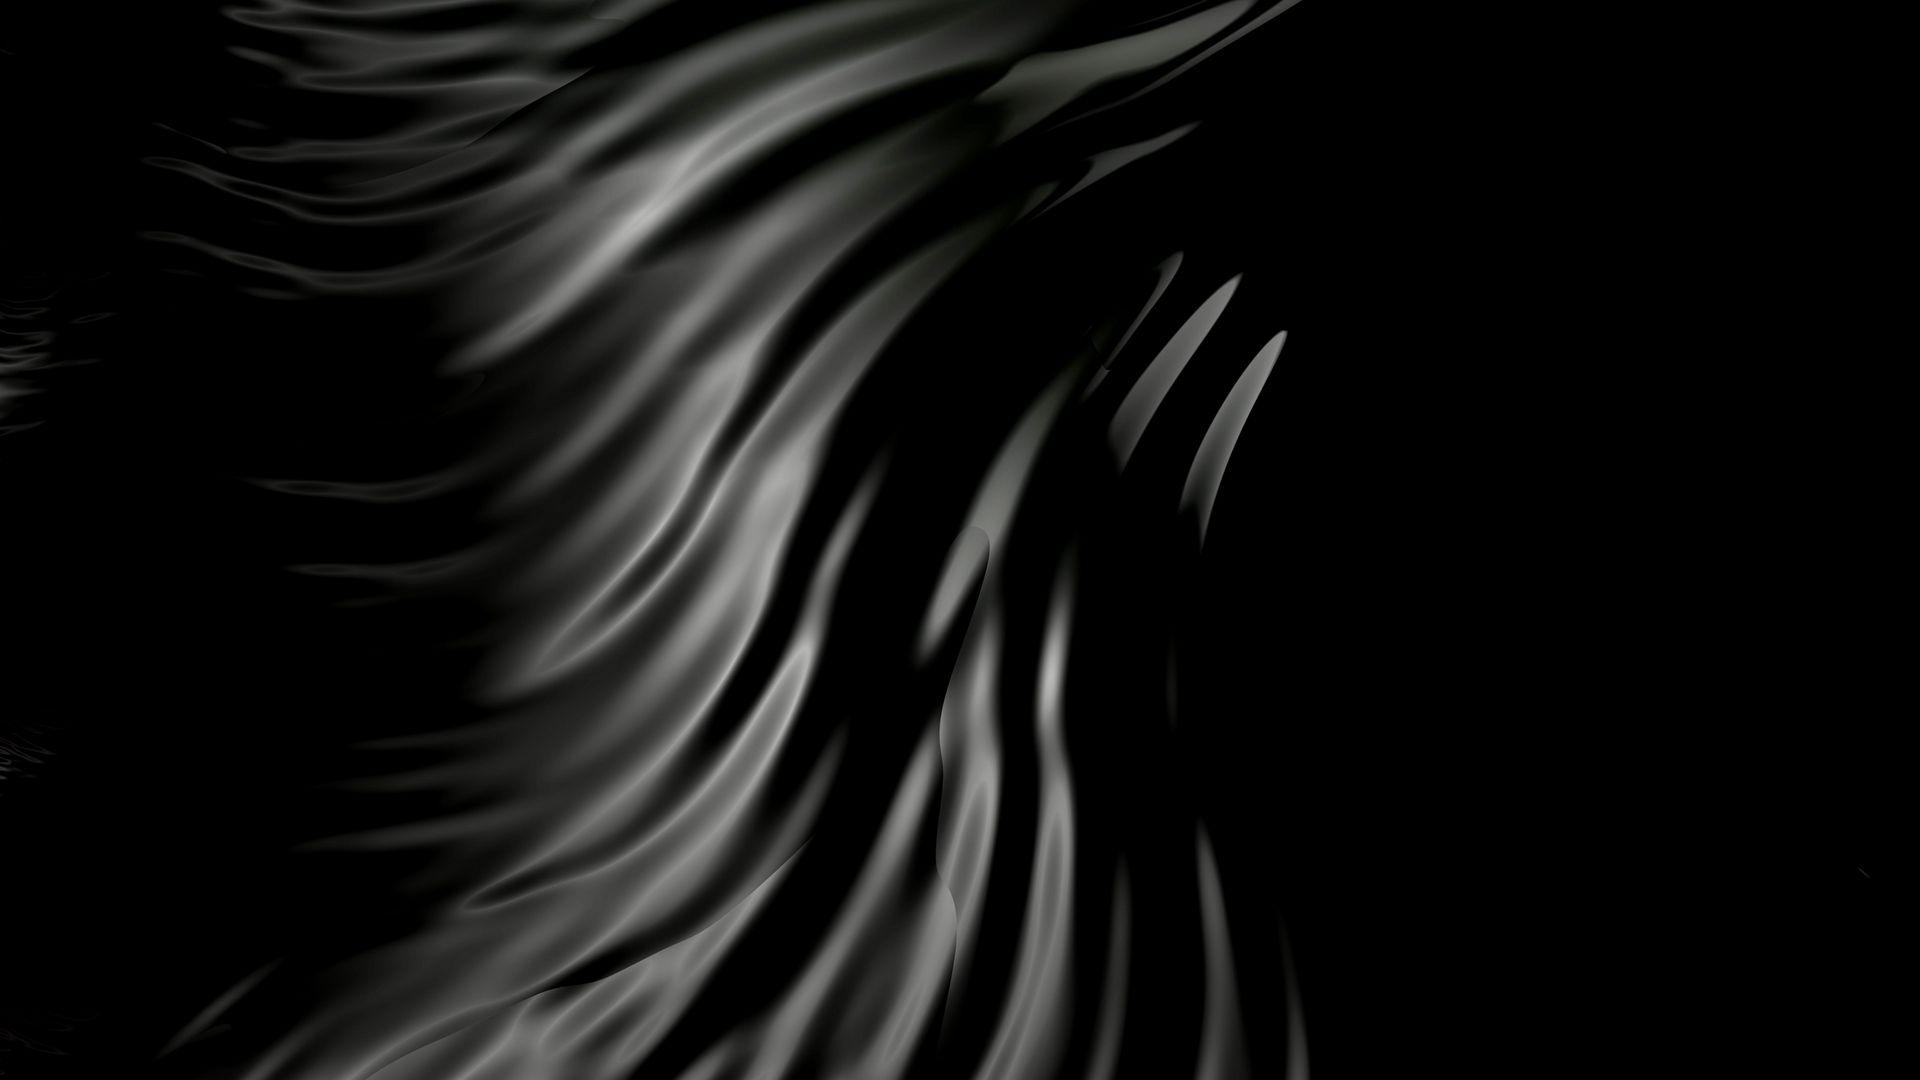 Texture Wavy Black X Hd Wallpaper Hd Wallpaper Wallpaper Textured Wallpaper